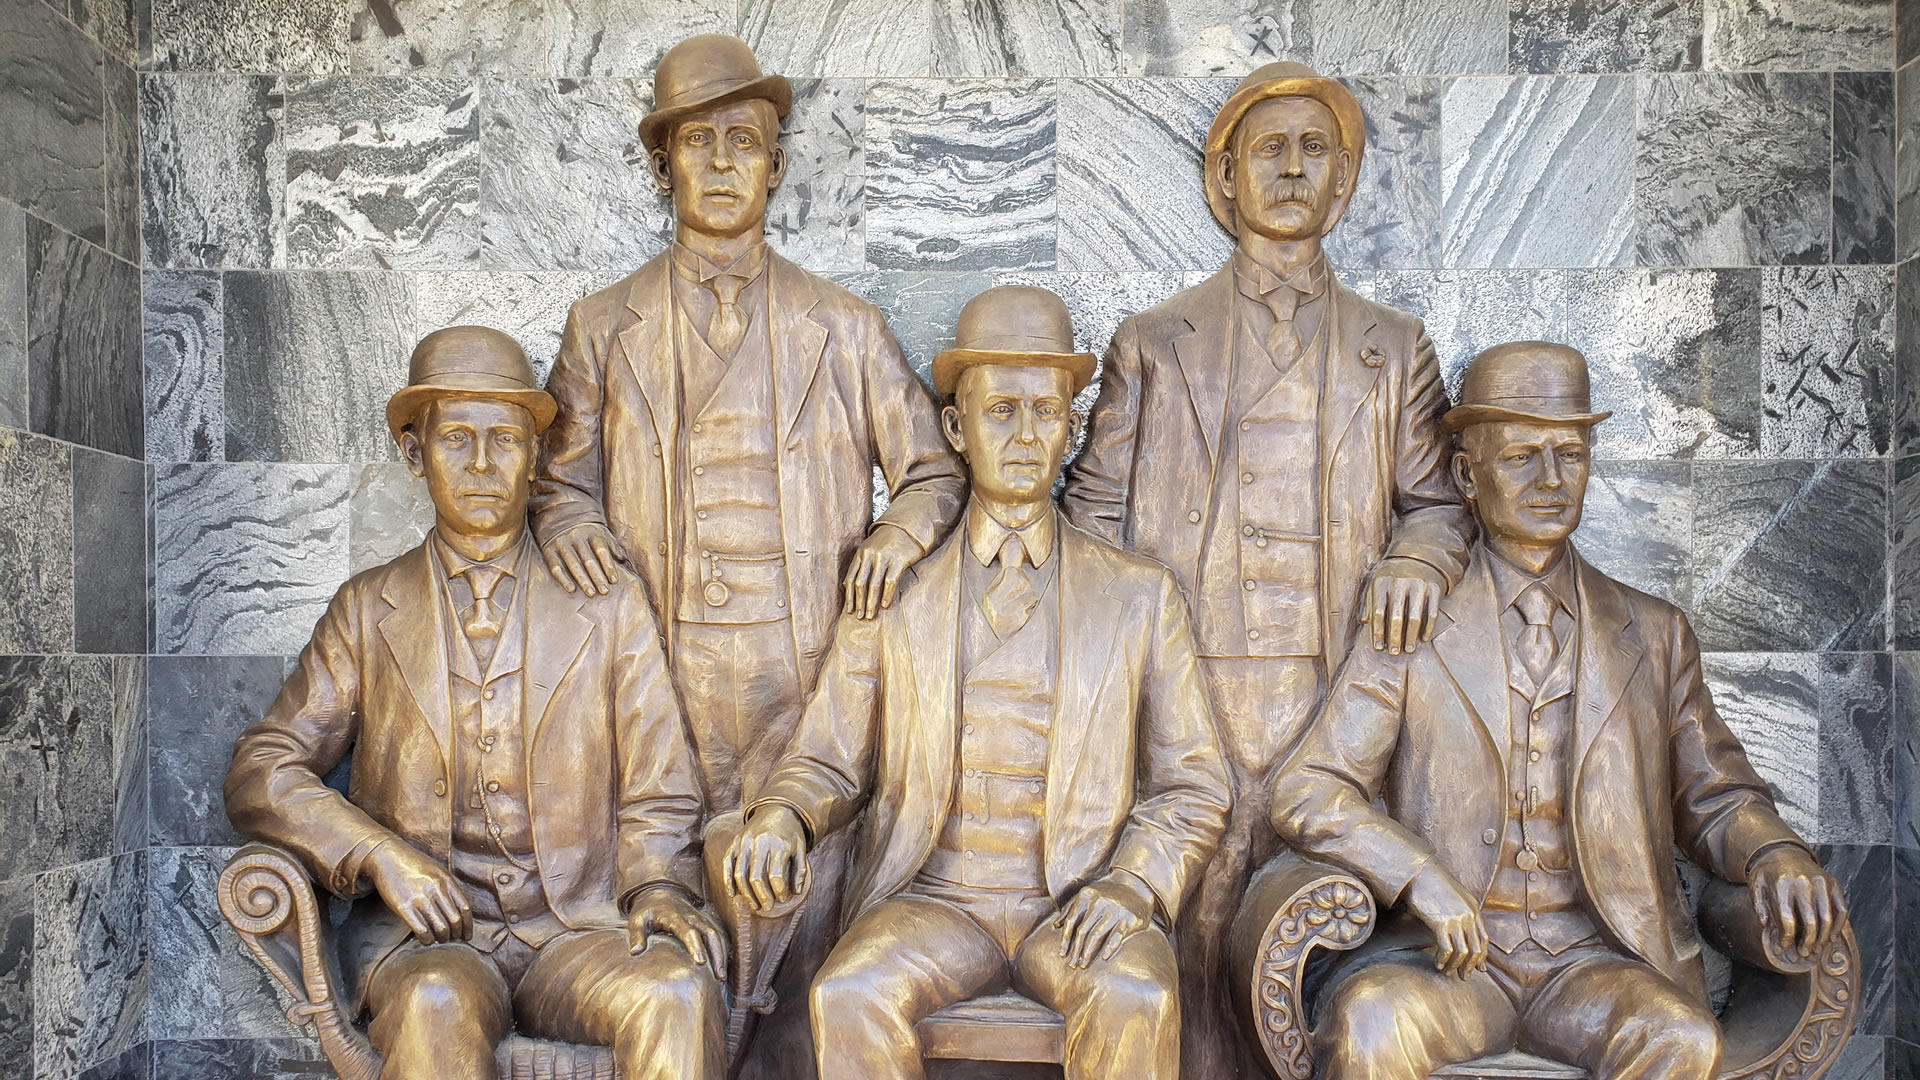 'THE WILD BUNCH' / Left to Right: Standing: Wm. Carver; Harvey Logan / Sitting: Harry Longabaugh; Ben Kilpatrick, Geo. Parker, alias 'Butch Cassidy'.